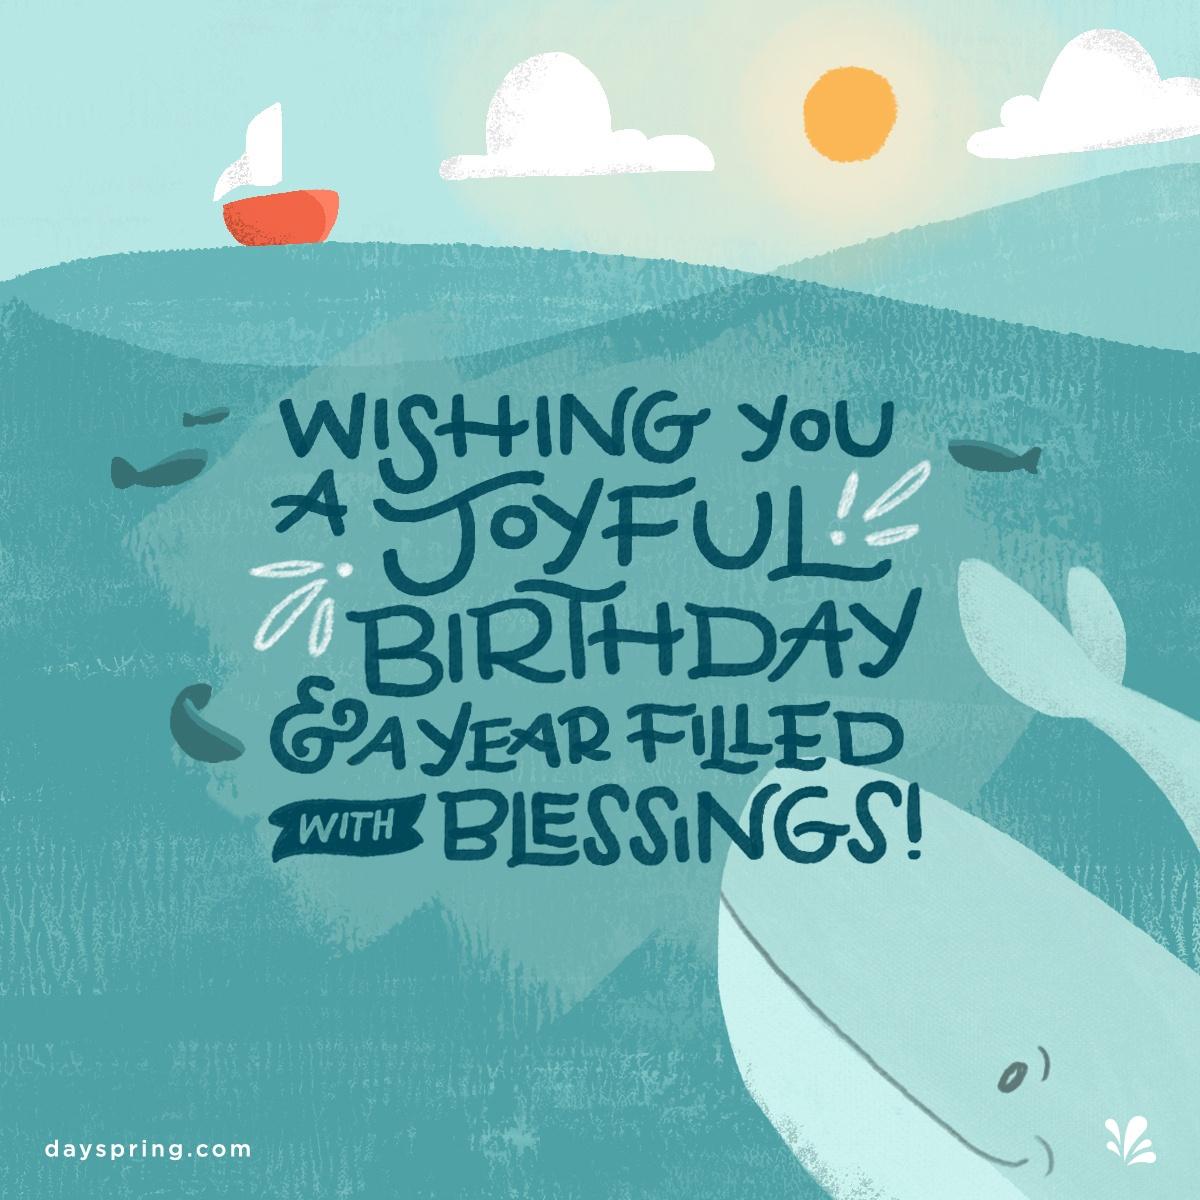 Birthday Ecards   Dayspring - Free Printable Christian Birthday Greeting Cards